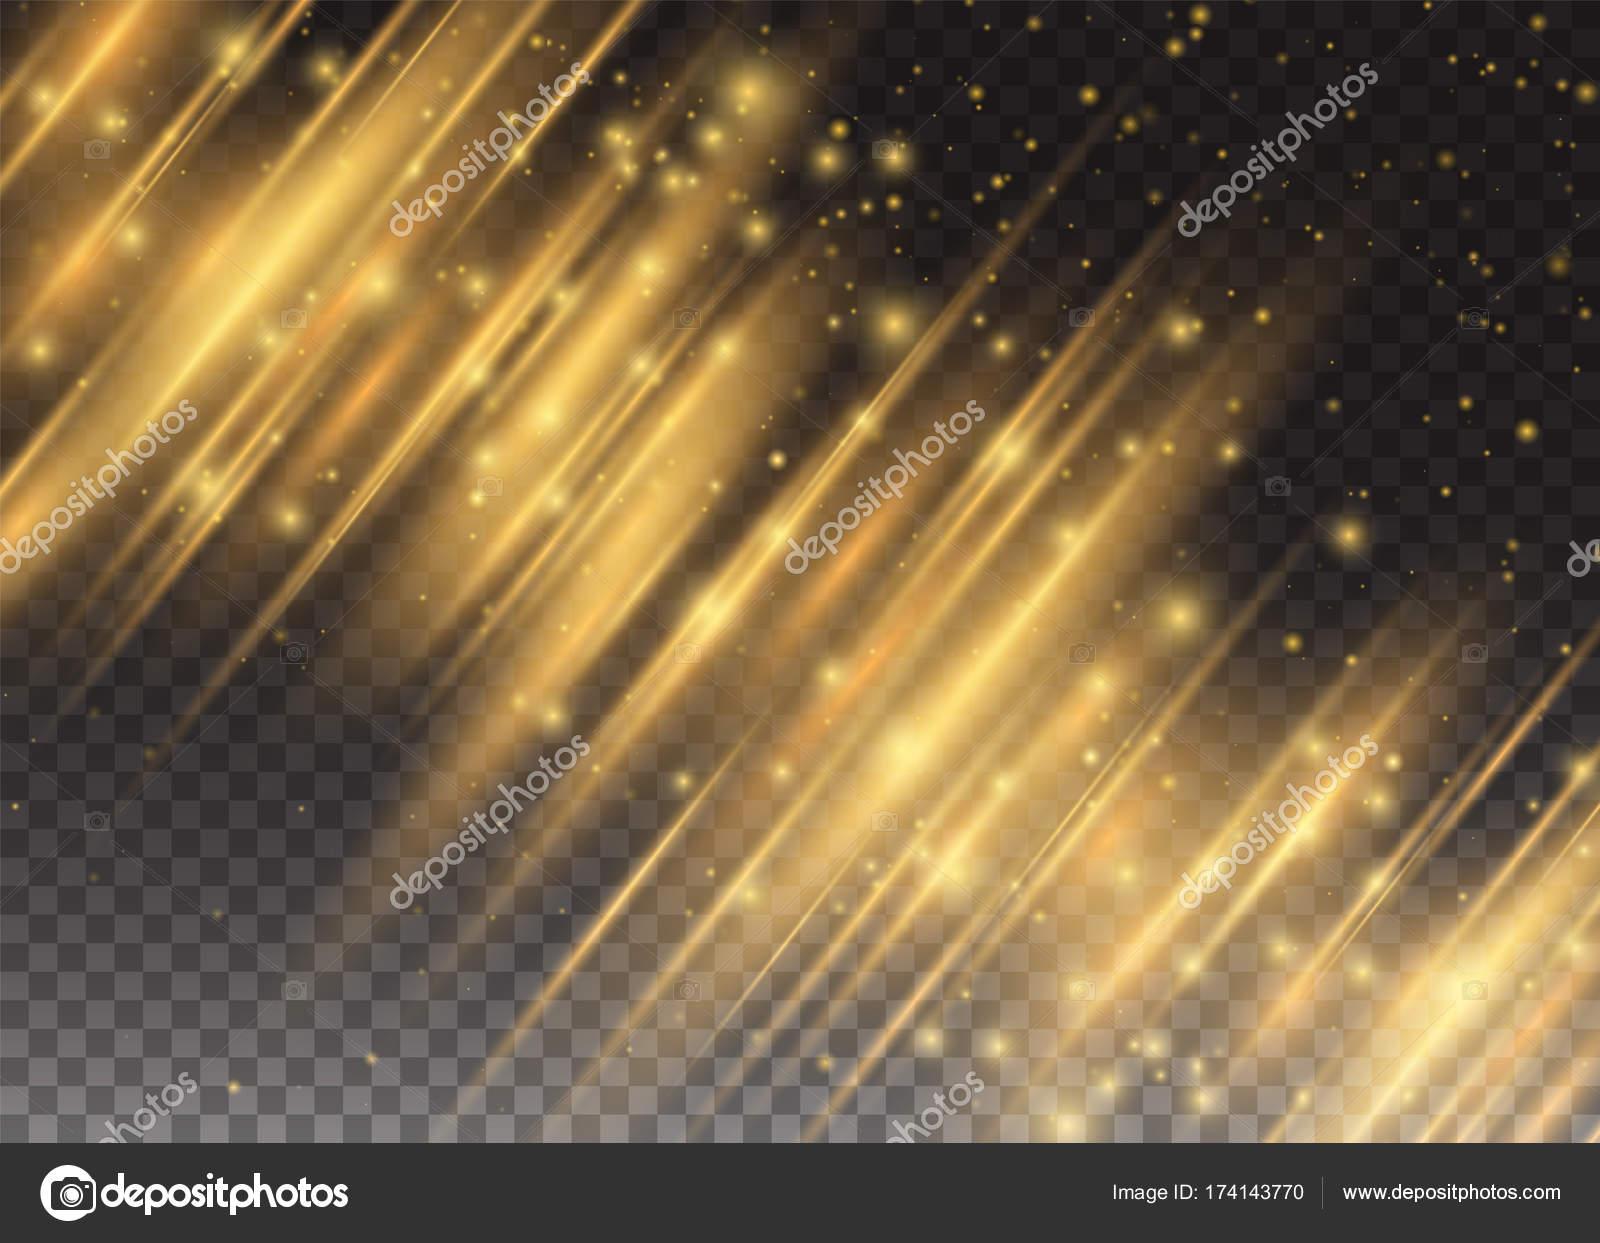 This lighting enhance your design work look modern. golden lights